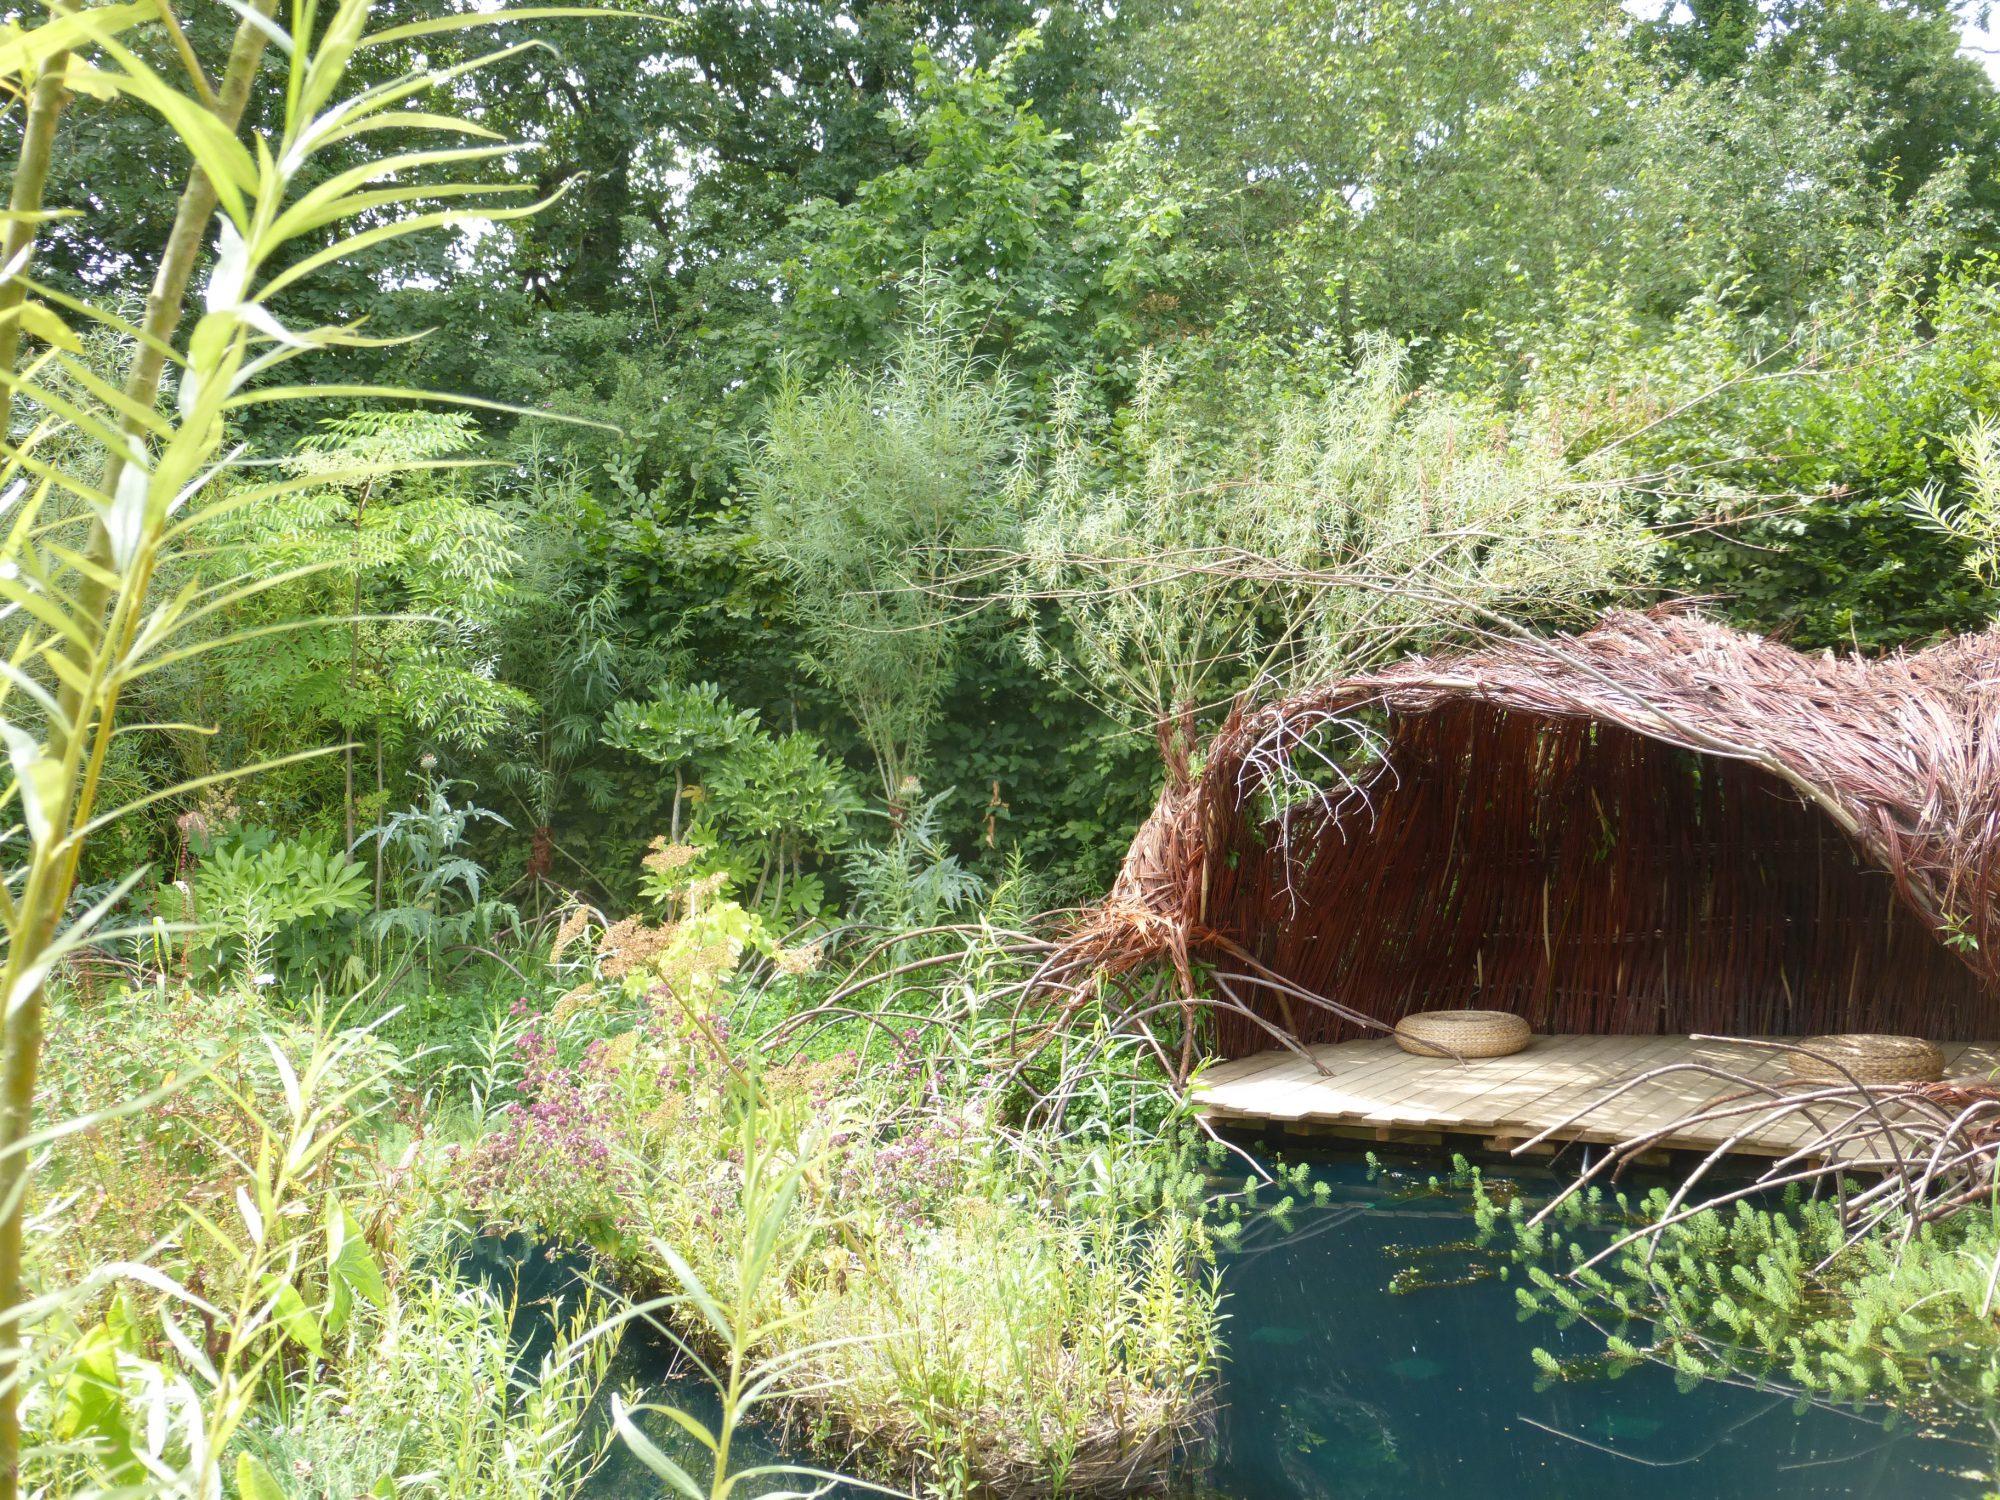 Chaumont drijvende tuin